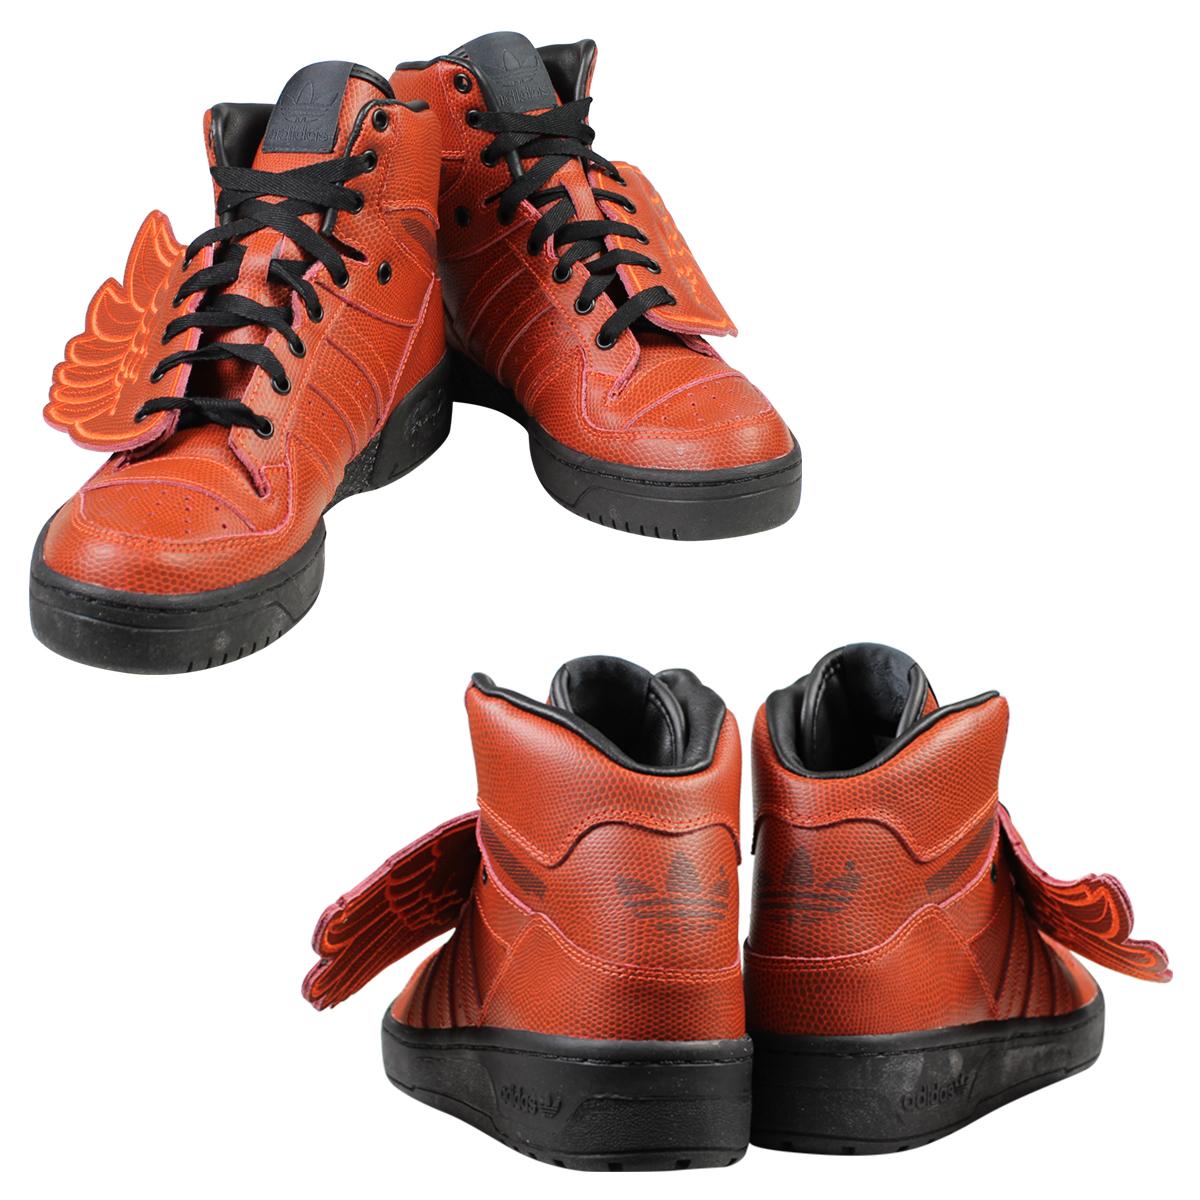 Adidas originals adidas Originals JEREMY SCOTT men s women s BBALL JS WINGS  sneakers Jeremy Scott wings basketball S77803 Red 84b7095d2c